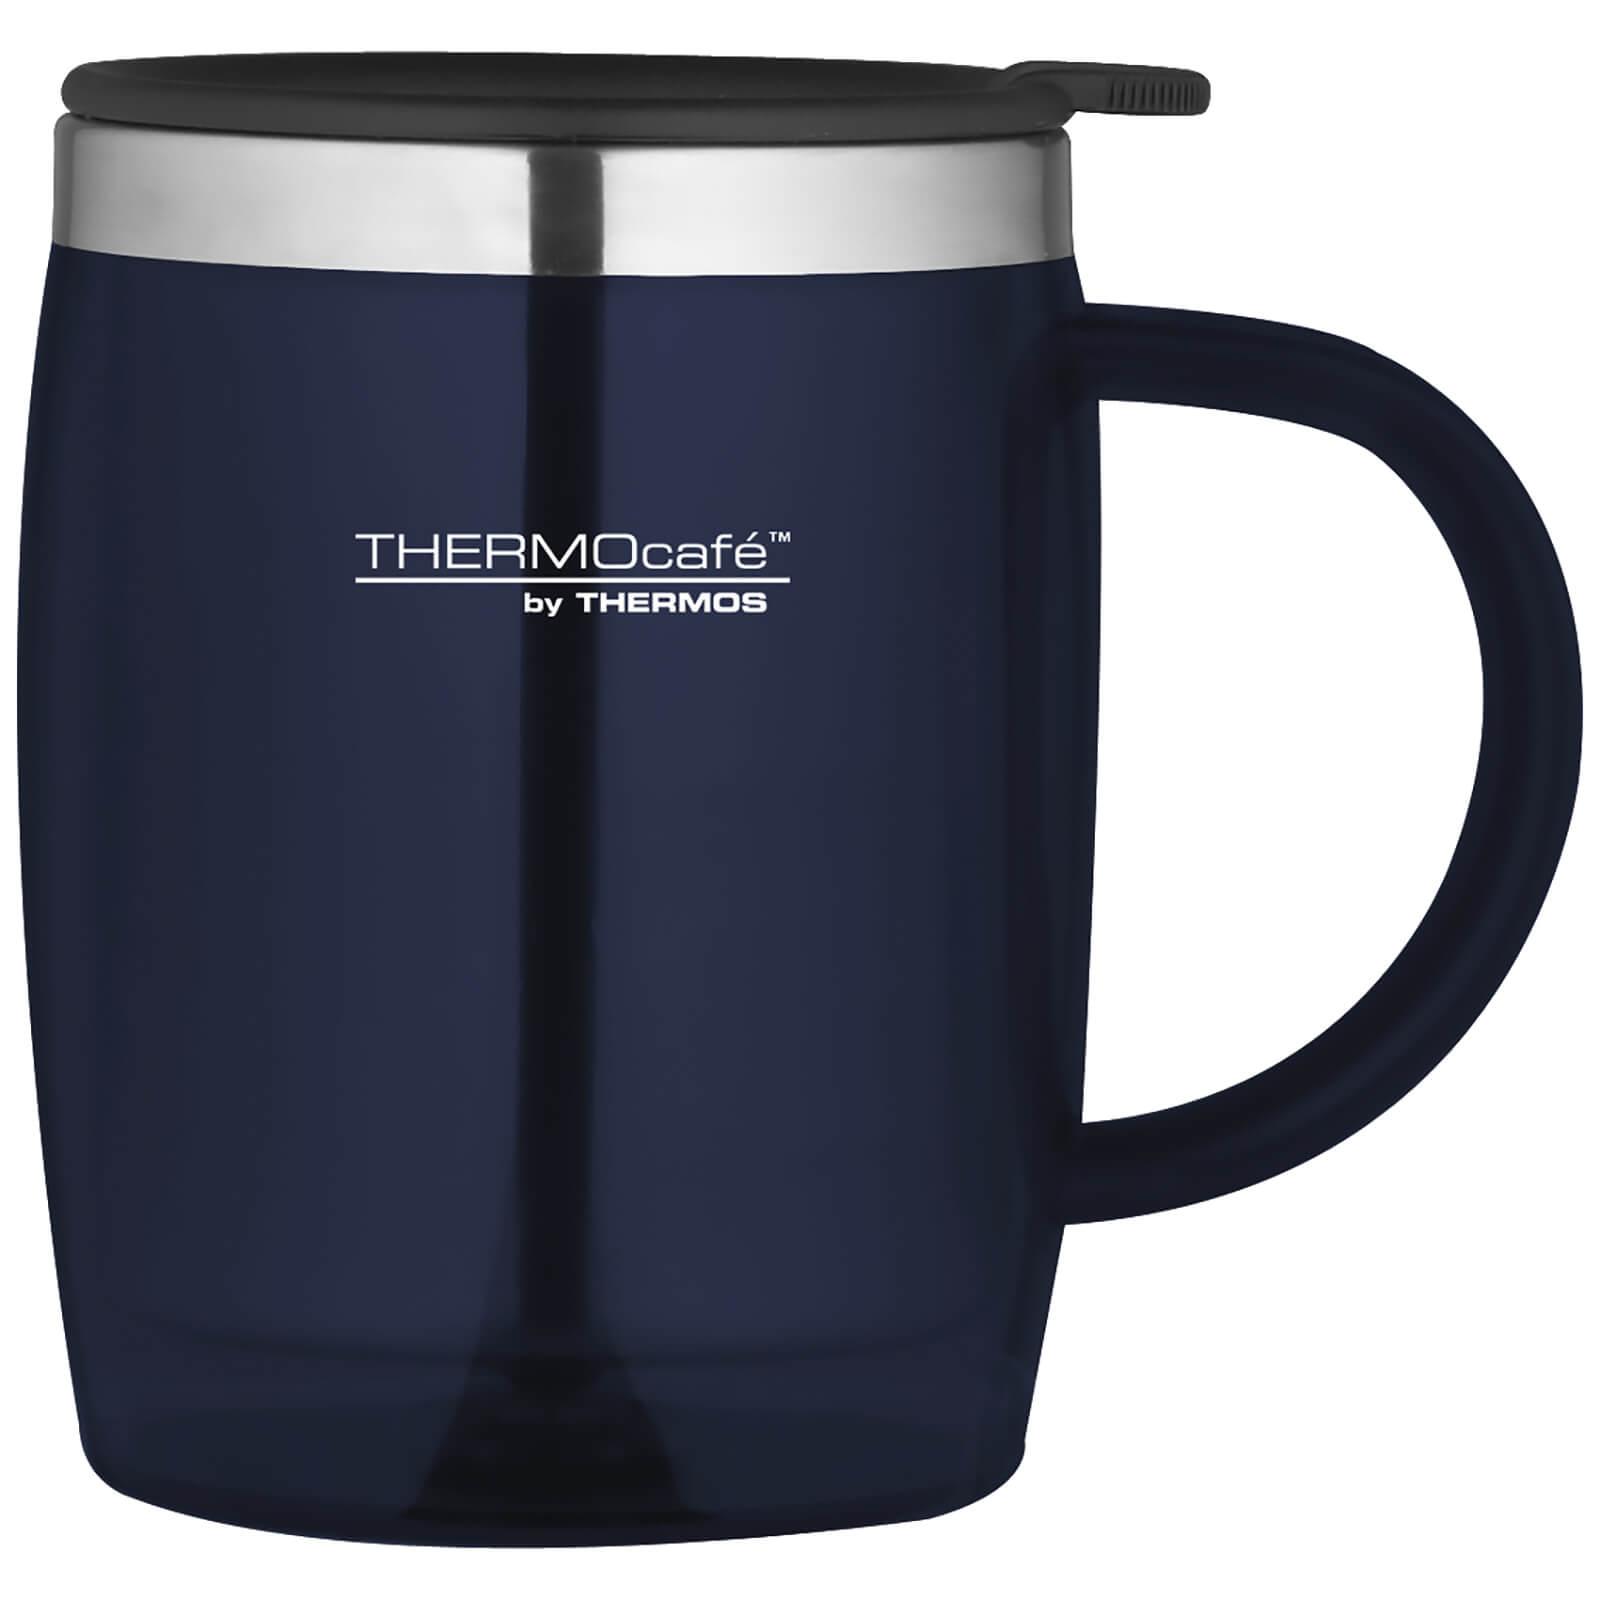 Thermos ThermoCafe Translucent Desk Mug - Blue 450ml